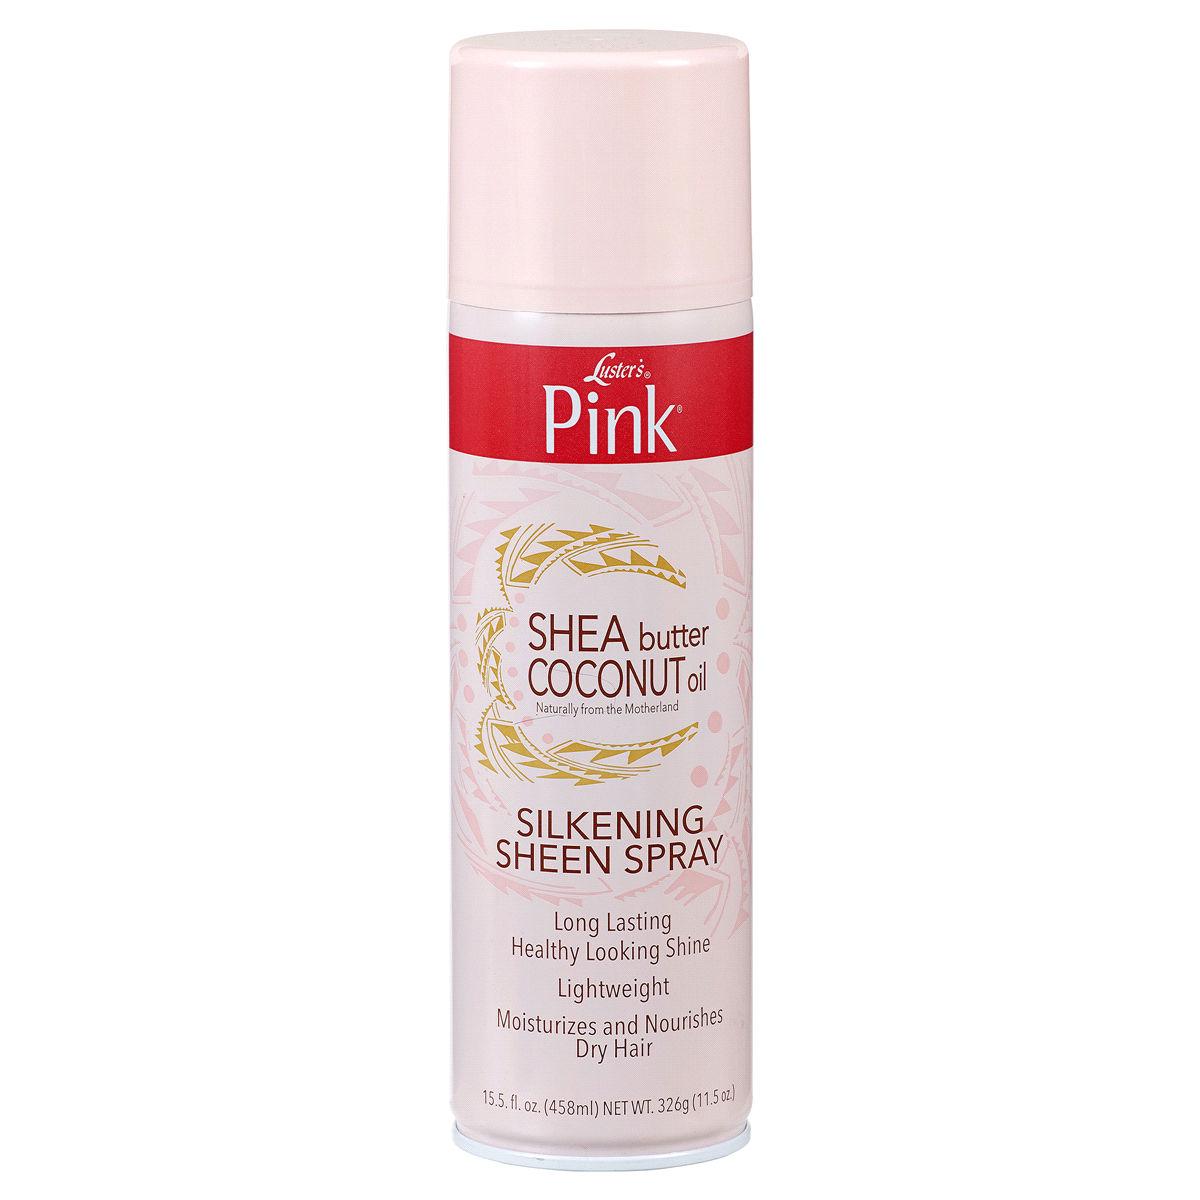 Luster's Pink Shea Butter Coconut Oil Silkening Sheen Spray - 15.5oz